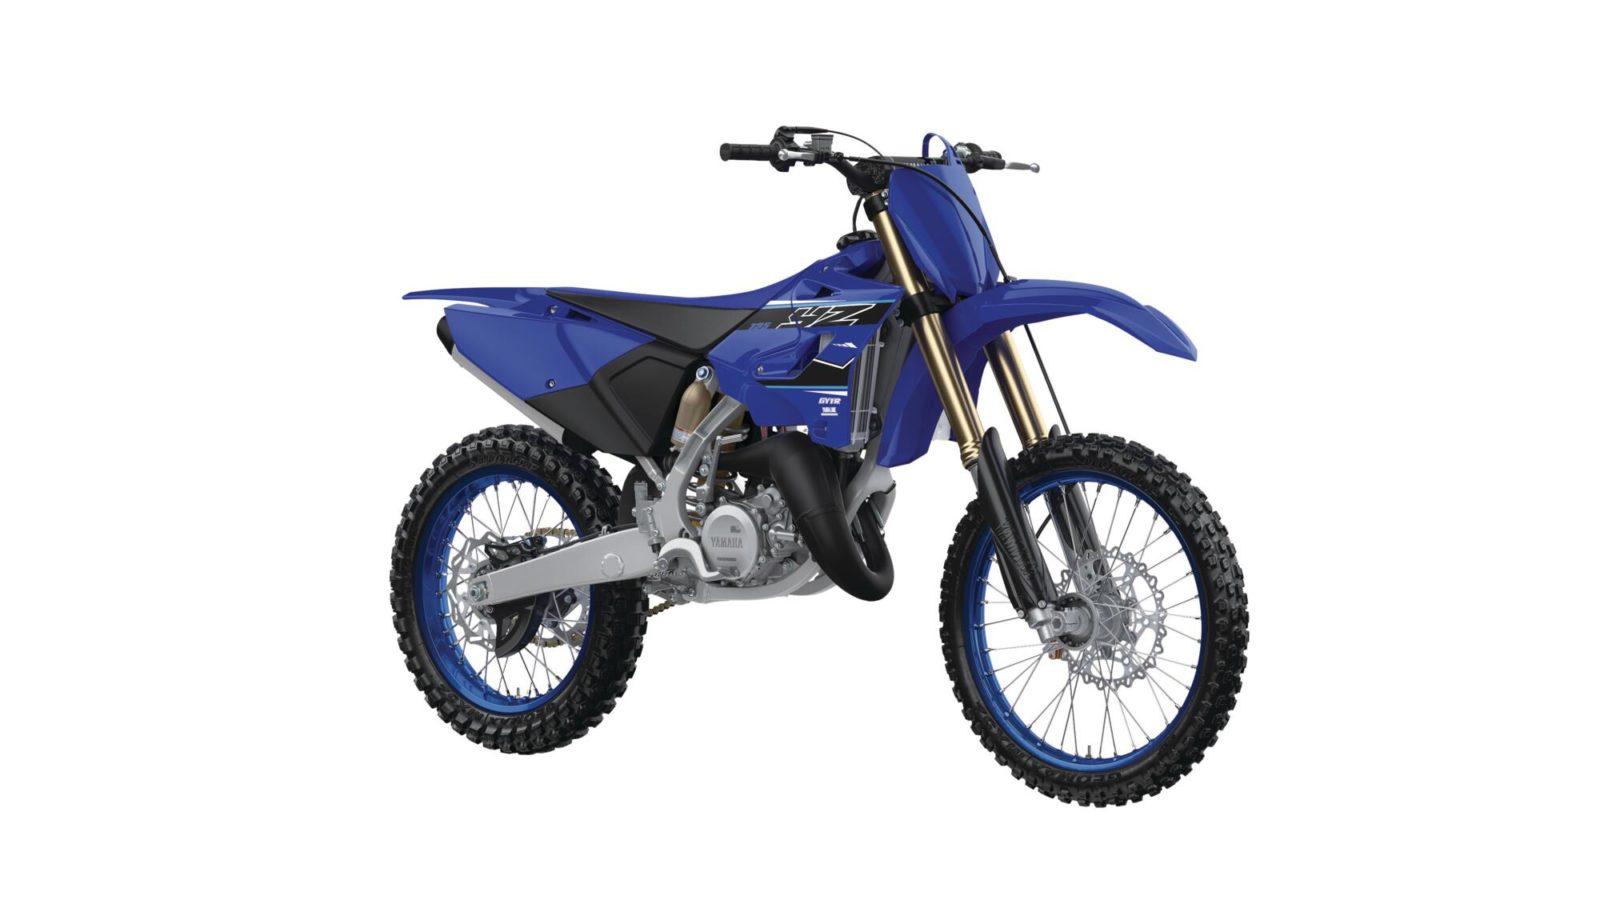 Yamaha Yz 125 Cross Opinie I Ceny Na Ceneo Pl